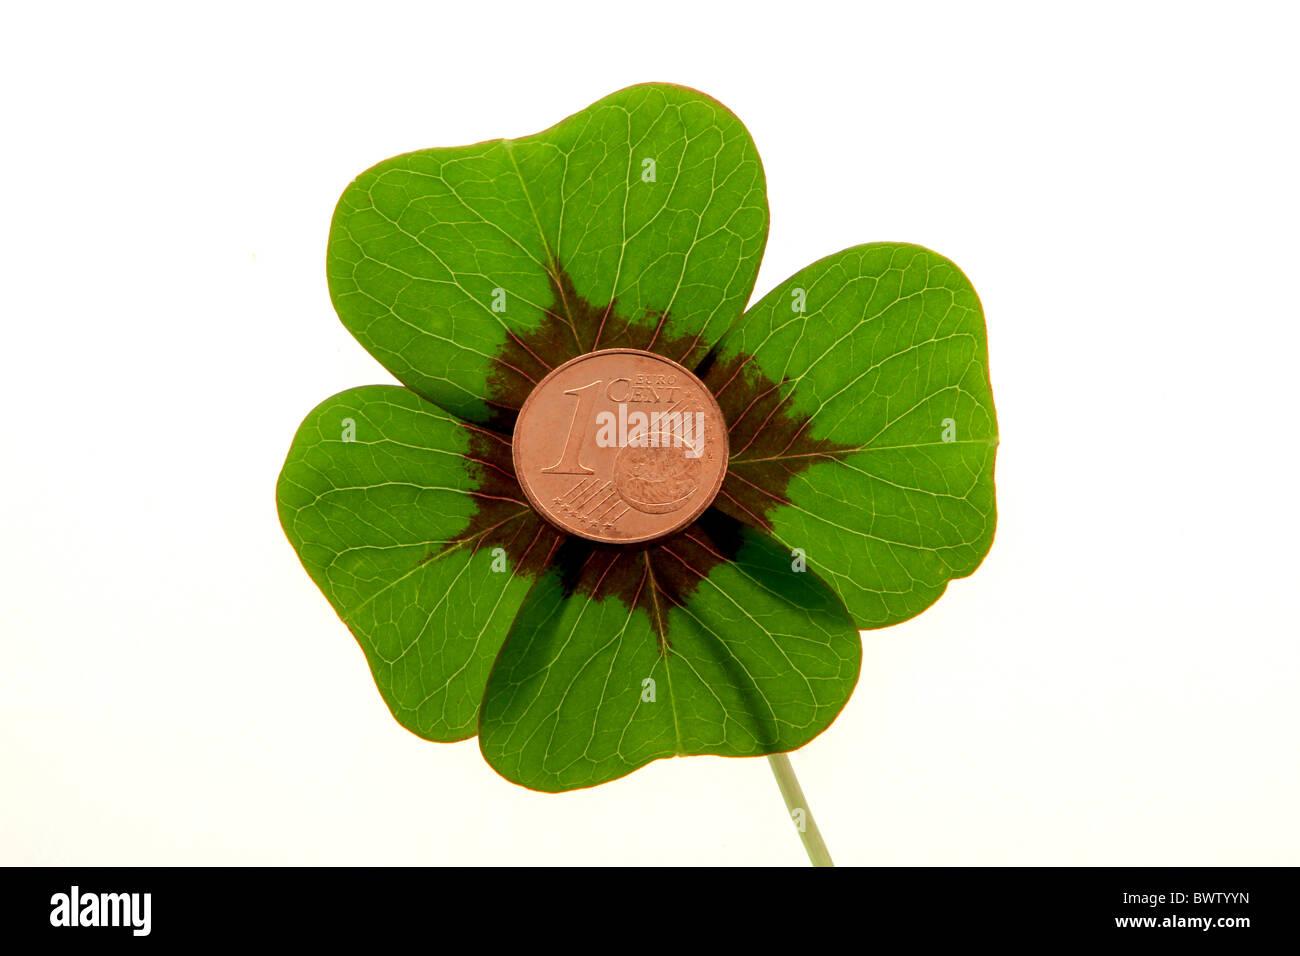 Four-leaf clover - Stock Image